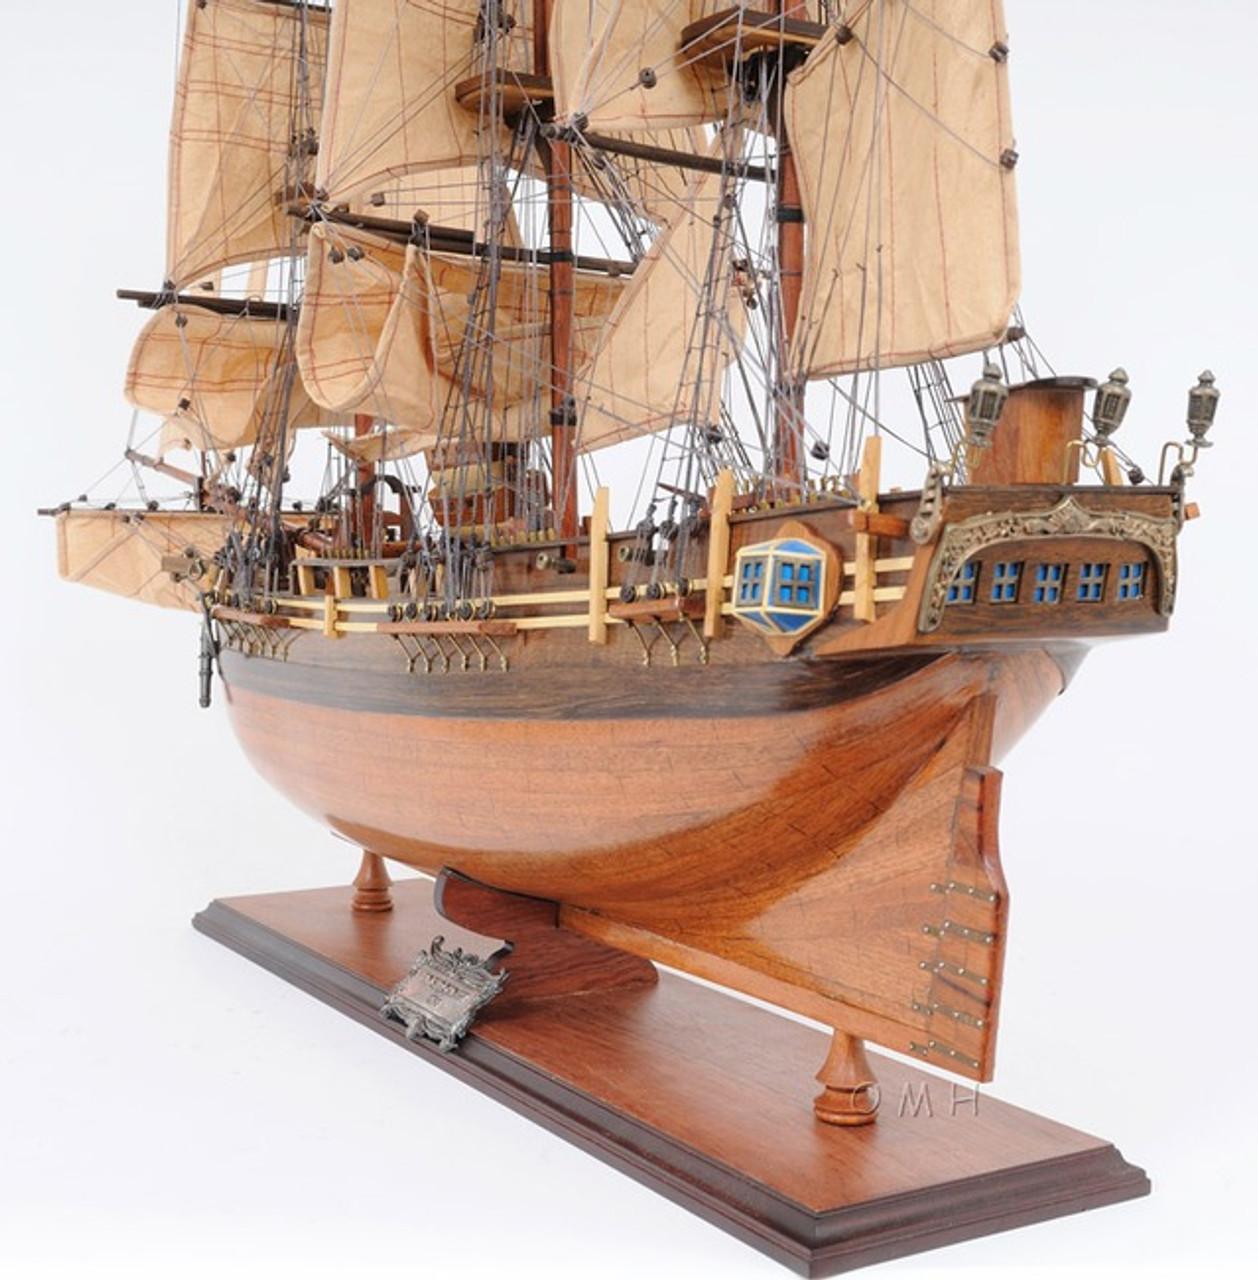 Hms Bounty Wooden Tall Ship Model 37 Sailboat William Bligh Boat Captjimscargo